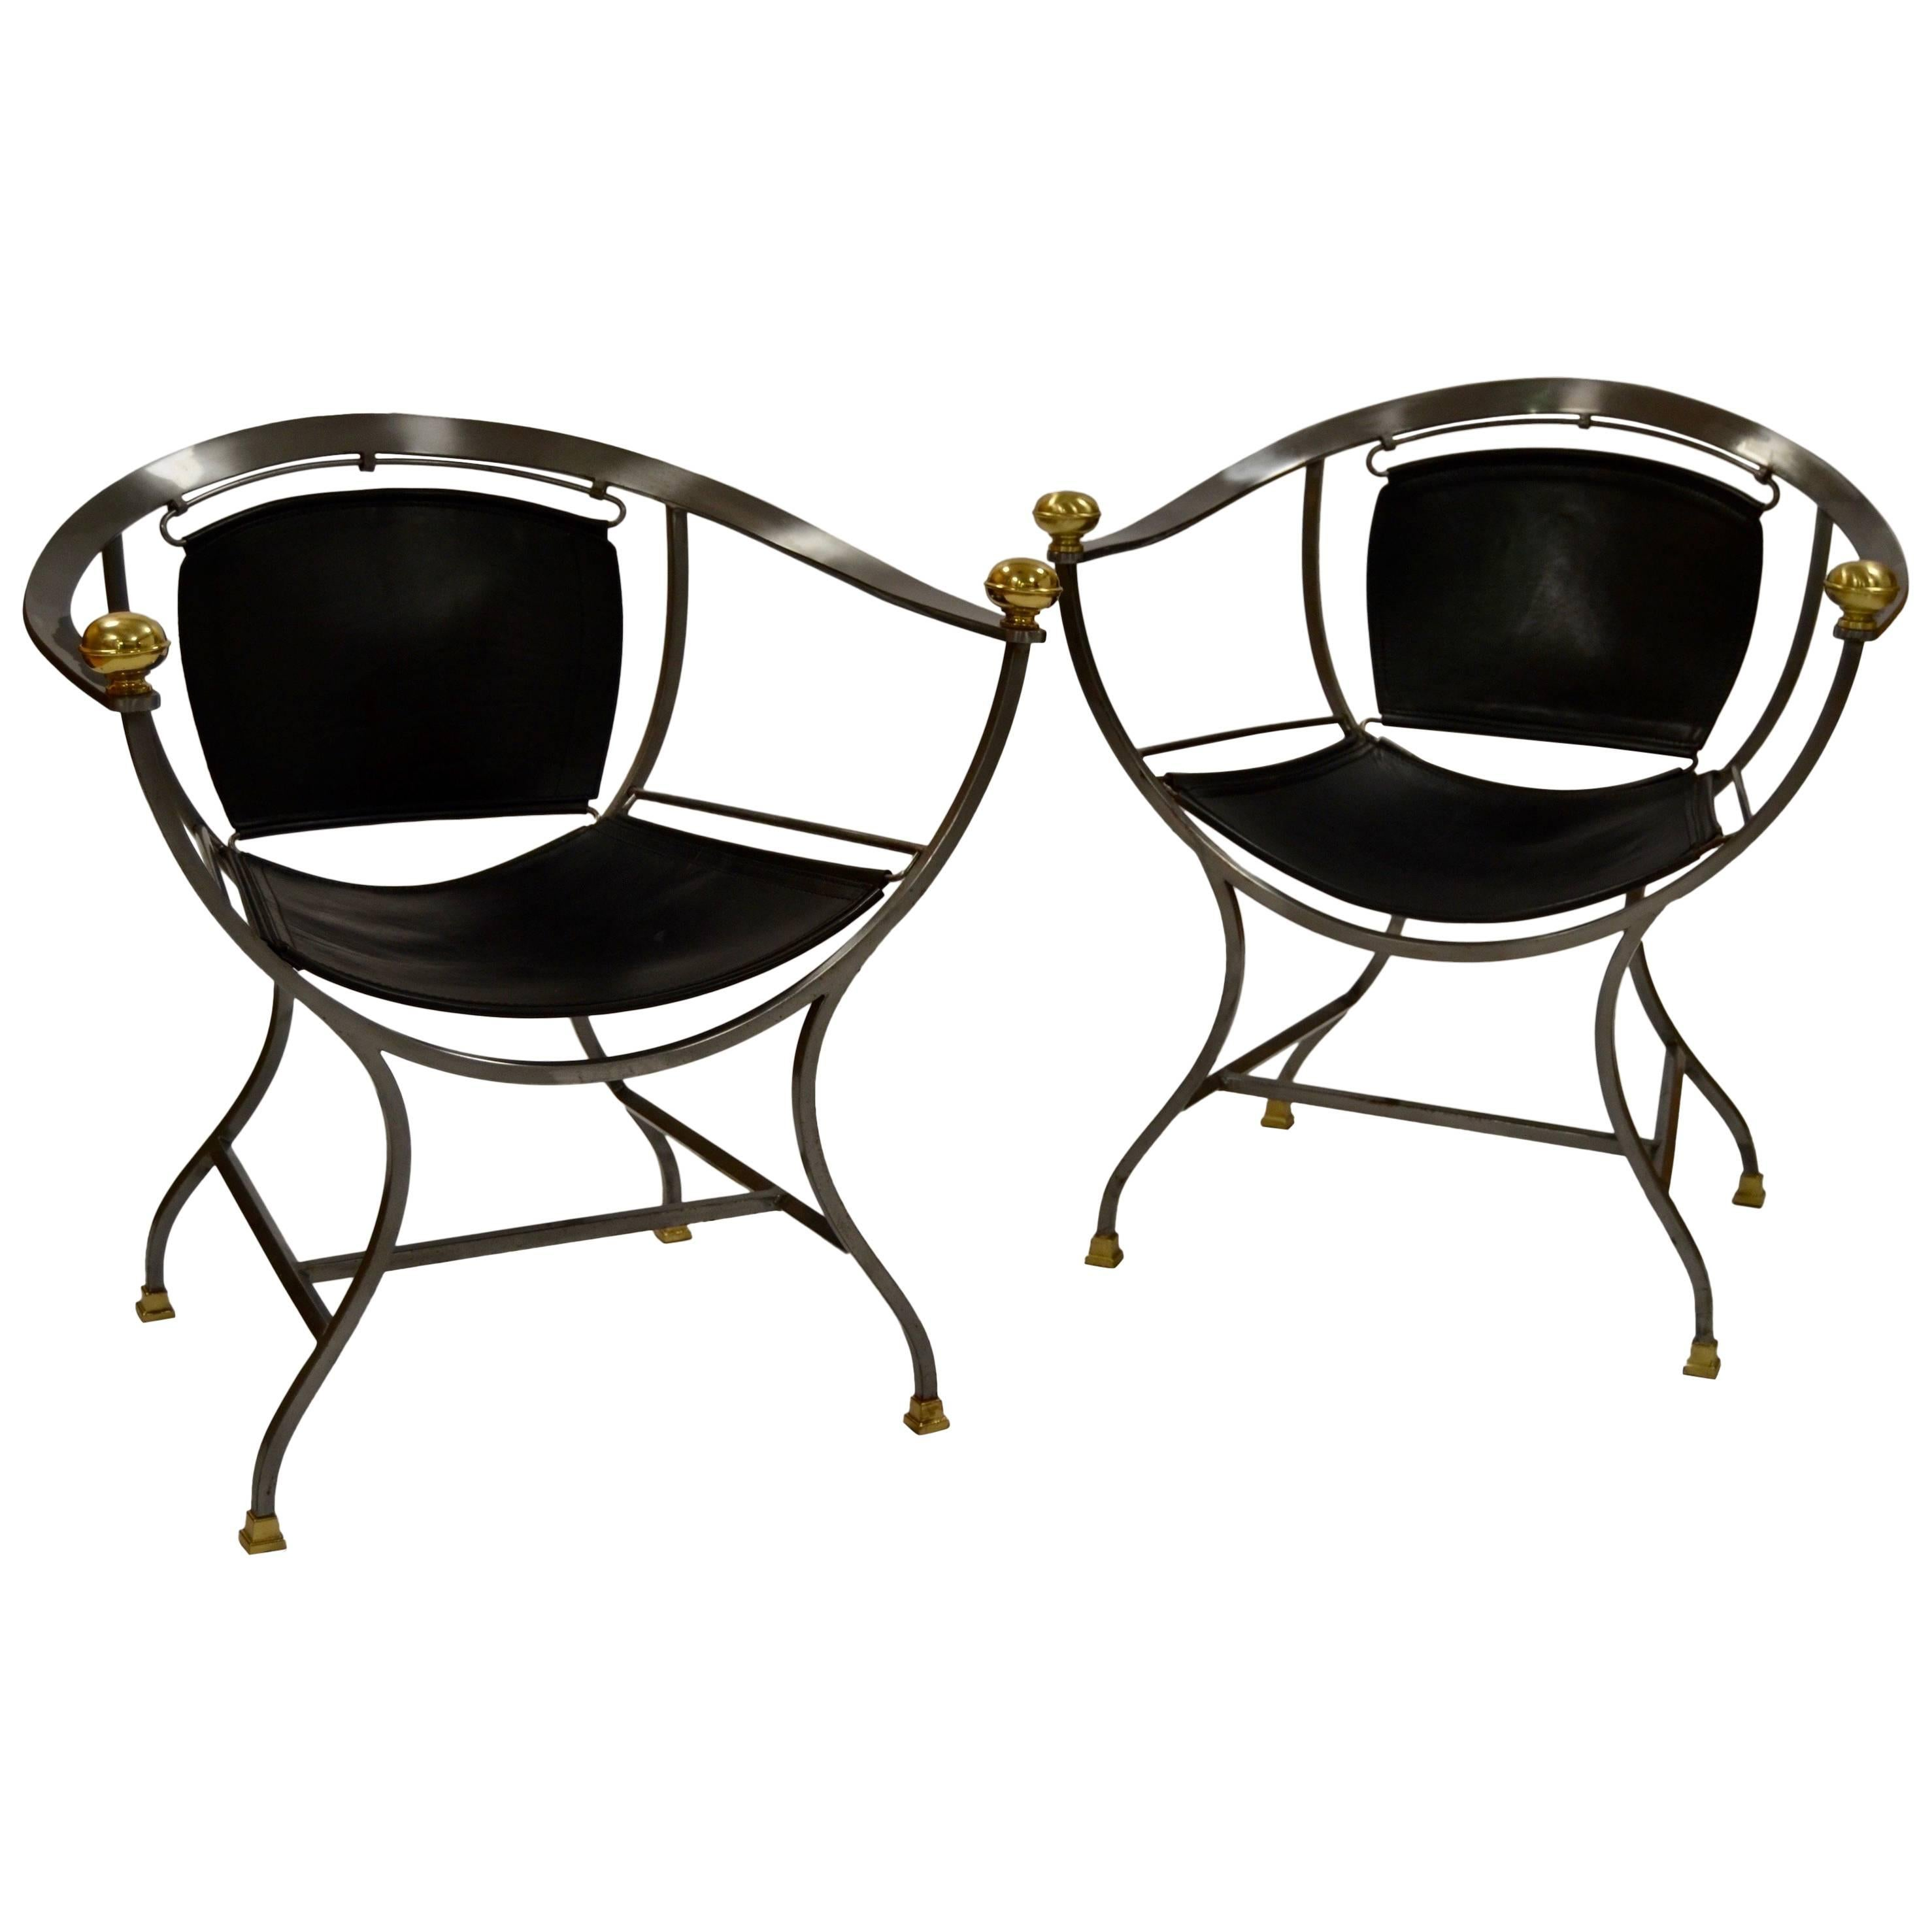 Two Armchairs 1970s Italian Designer Alberto Orlandi